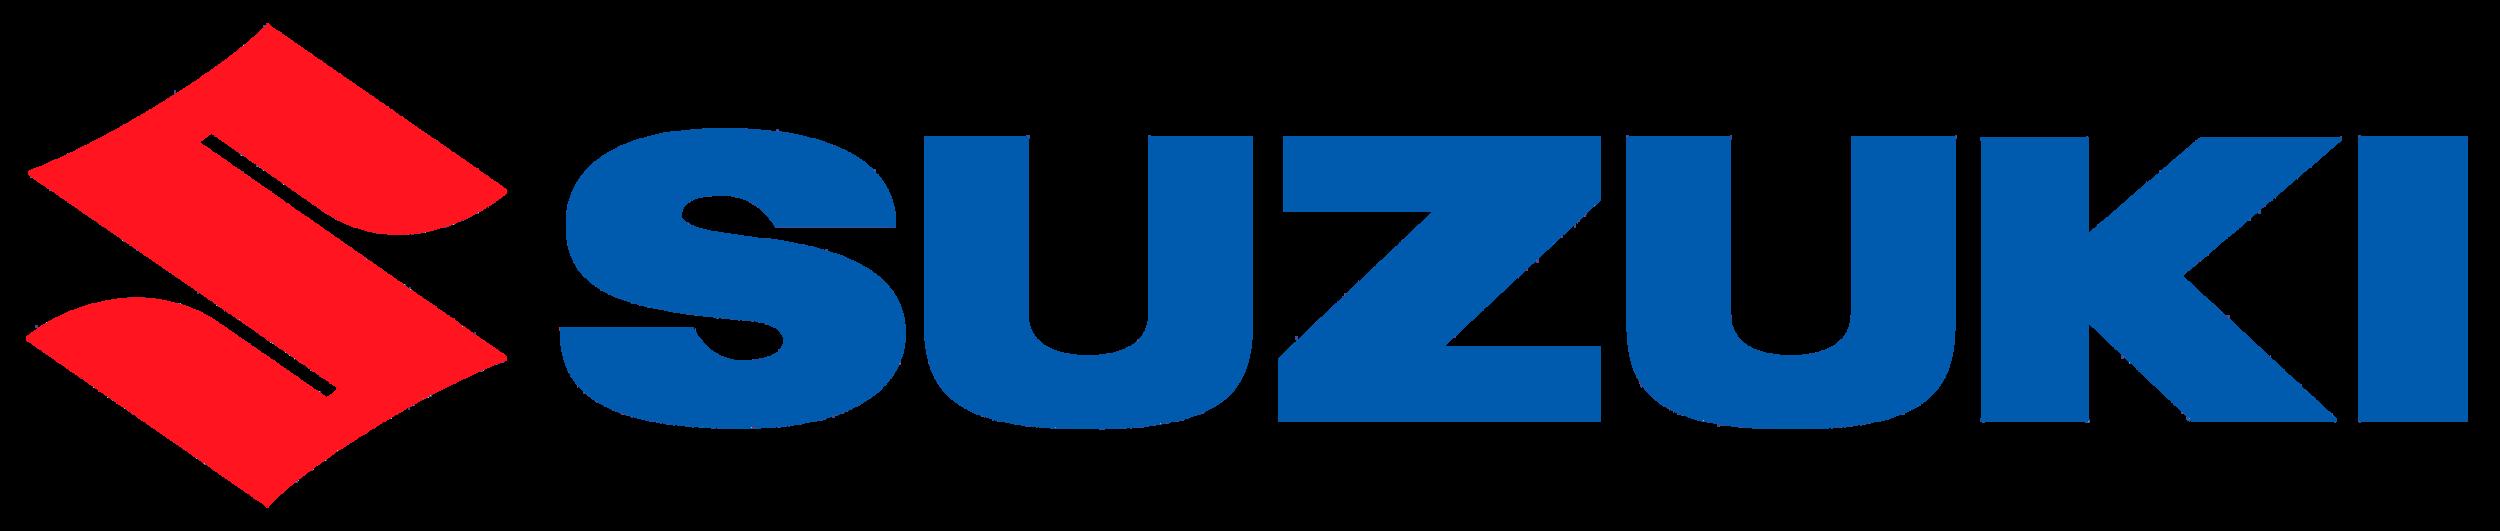 Suzuki liggende transparent.png